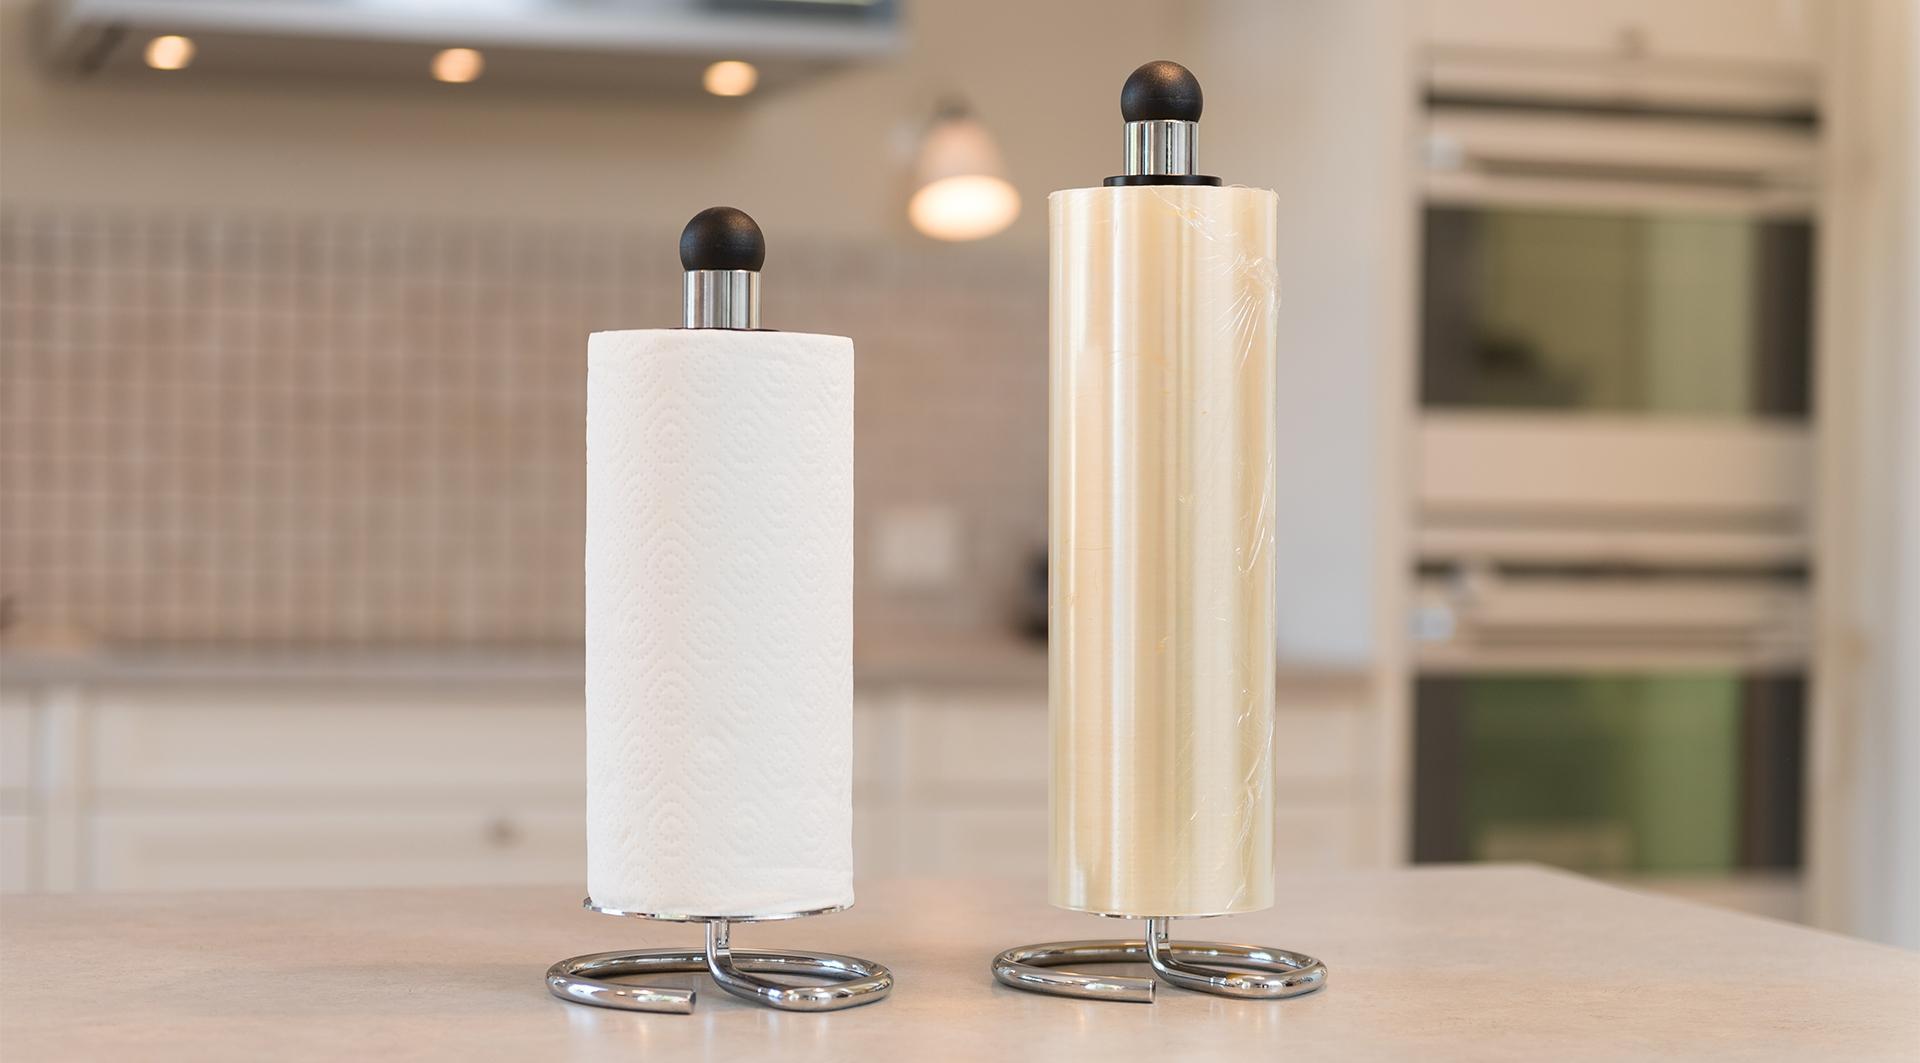 Snupit Paper som køkkenrulleholder og Snupit Wrapper som filmrulleholder